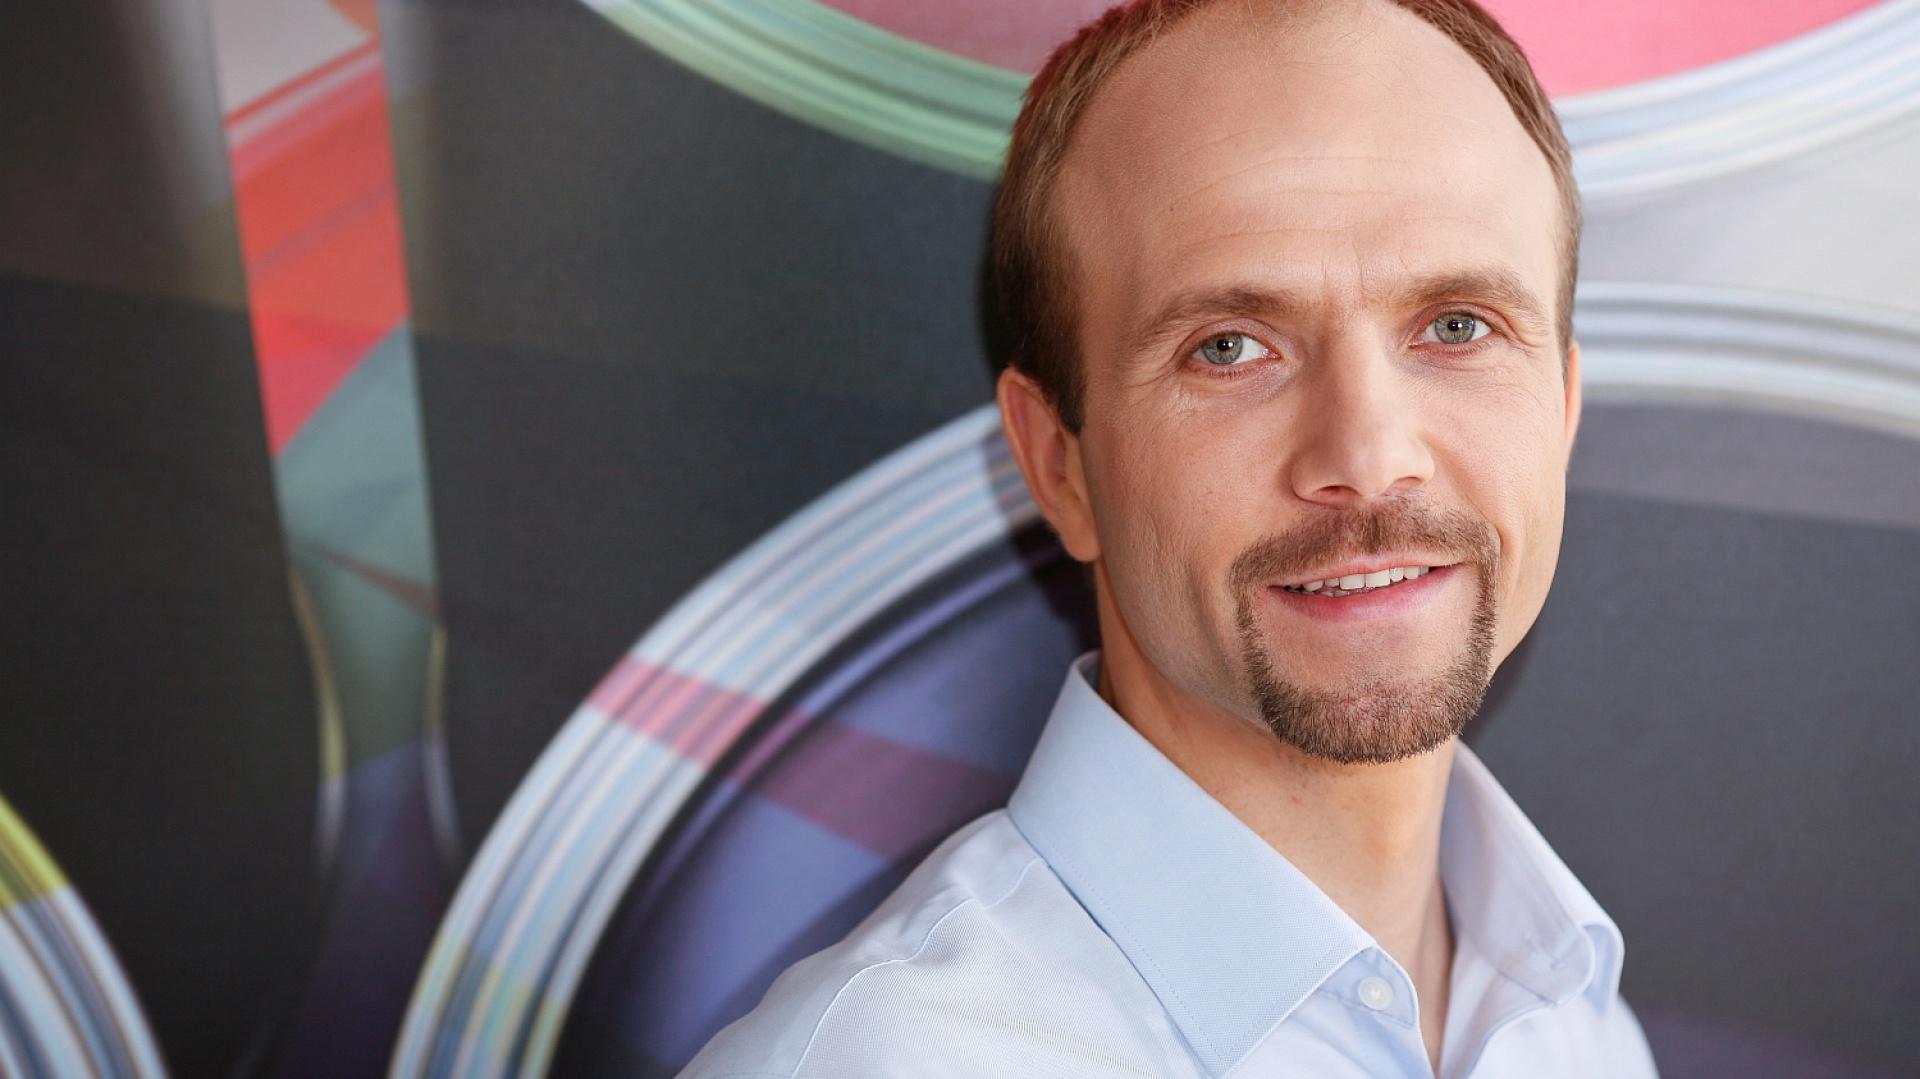 Nikodem Kowalski, ekspert ds. farb w firmie Dulux